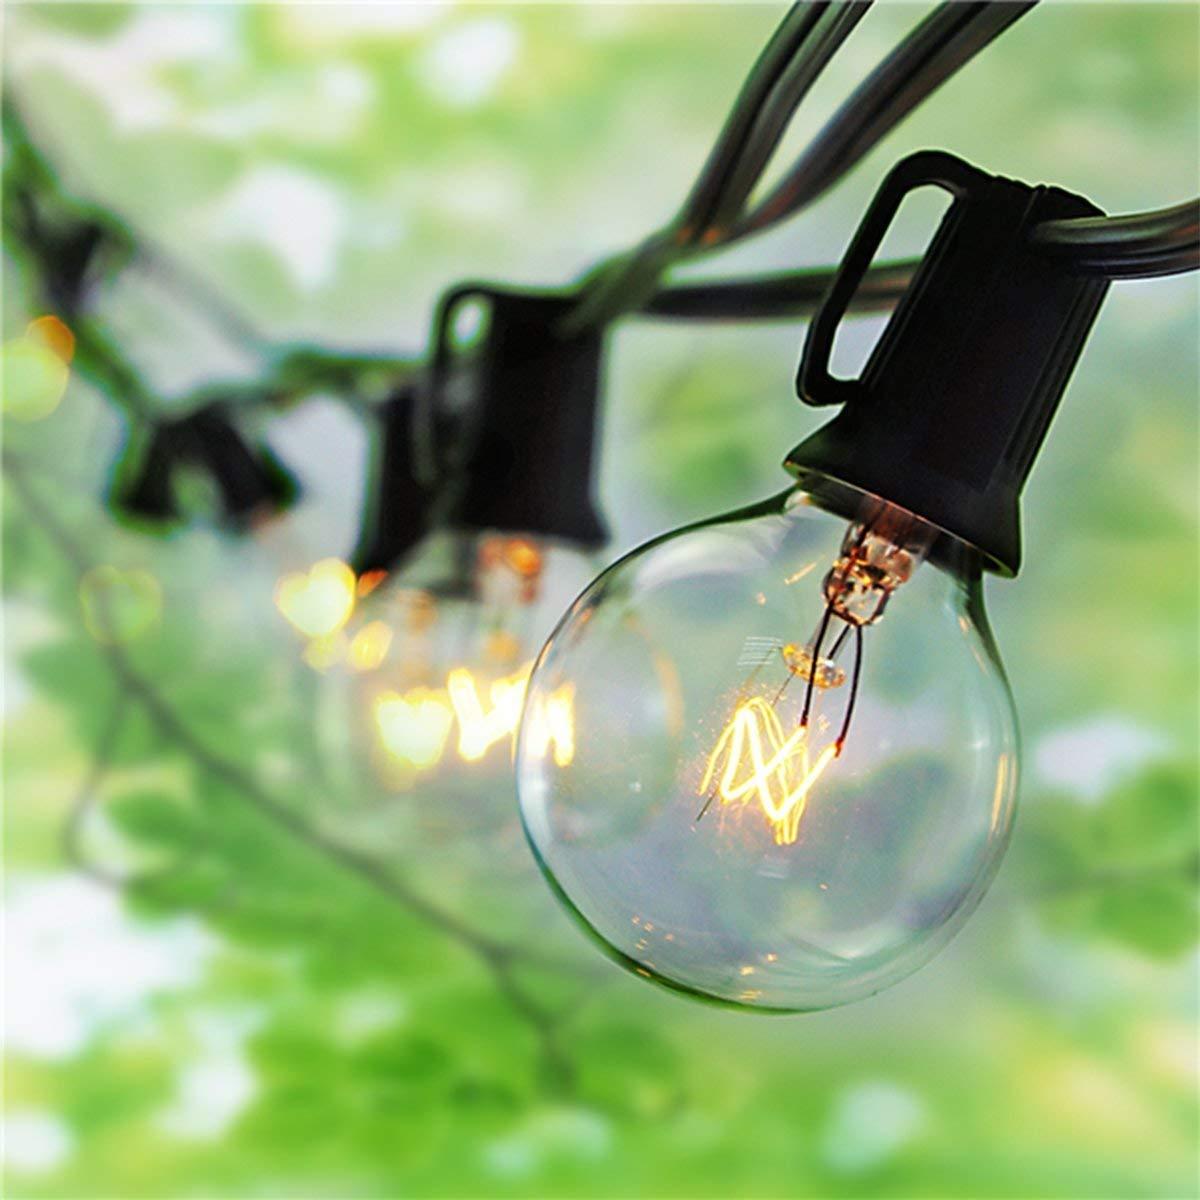 SkrLights 100 Foot String Lights Outdoor Lighting Garden Fairy Backyard Market Xmas Holiday Patio Party Globe String Lights G40 100 Clear Bulbs-Black Wire